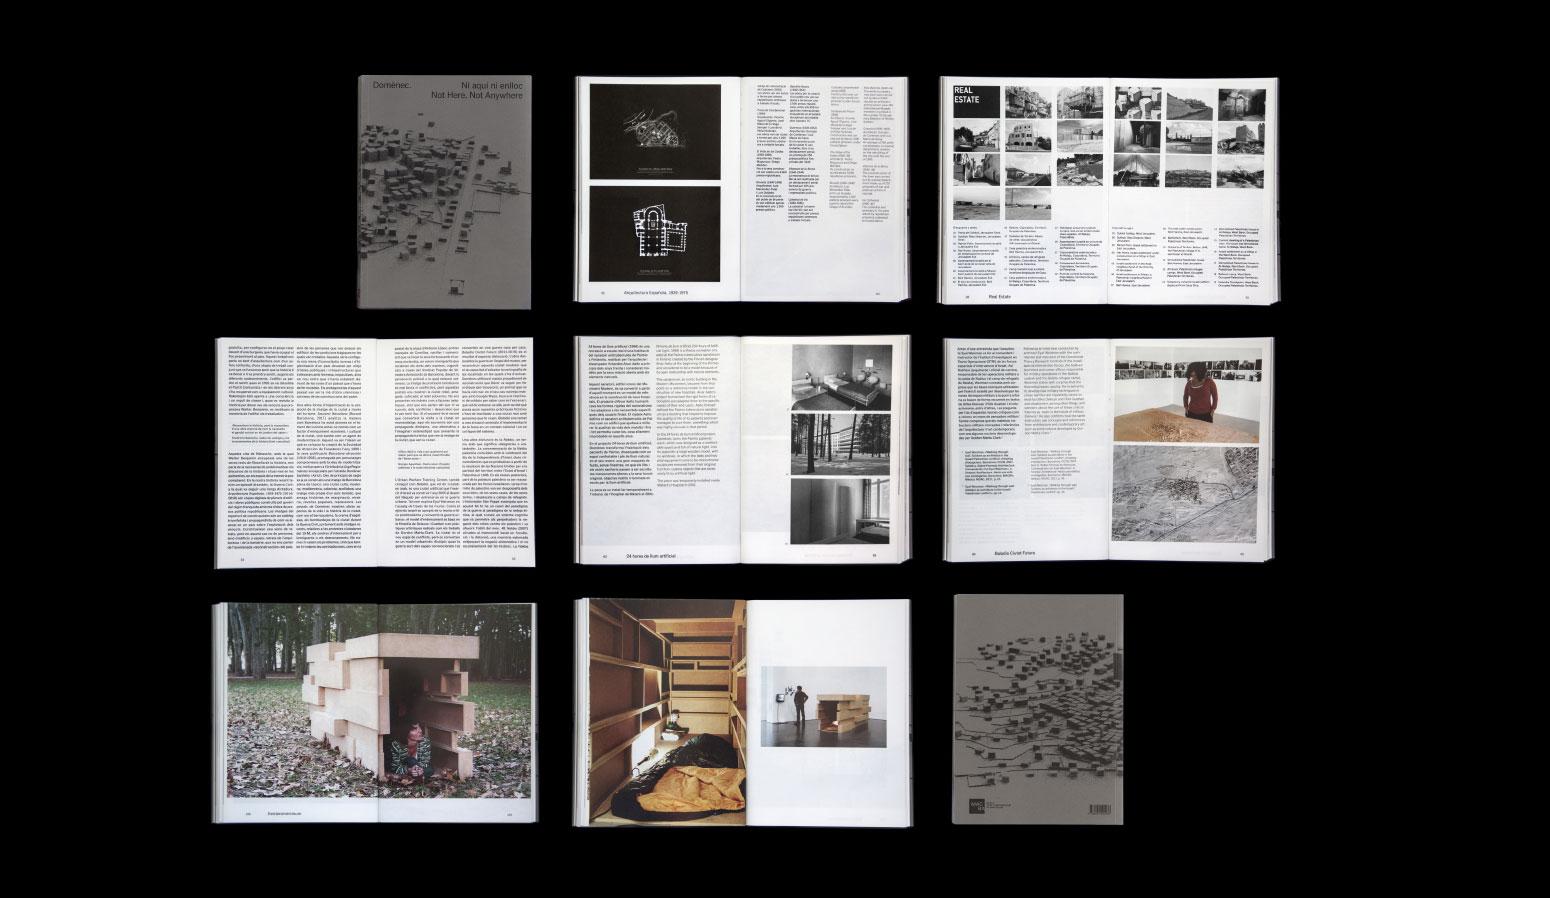 Publicación para MACBA - Museo de Arte Contemporáneo de Barcelona